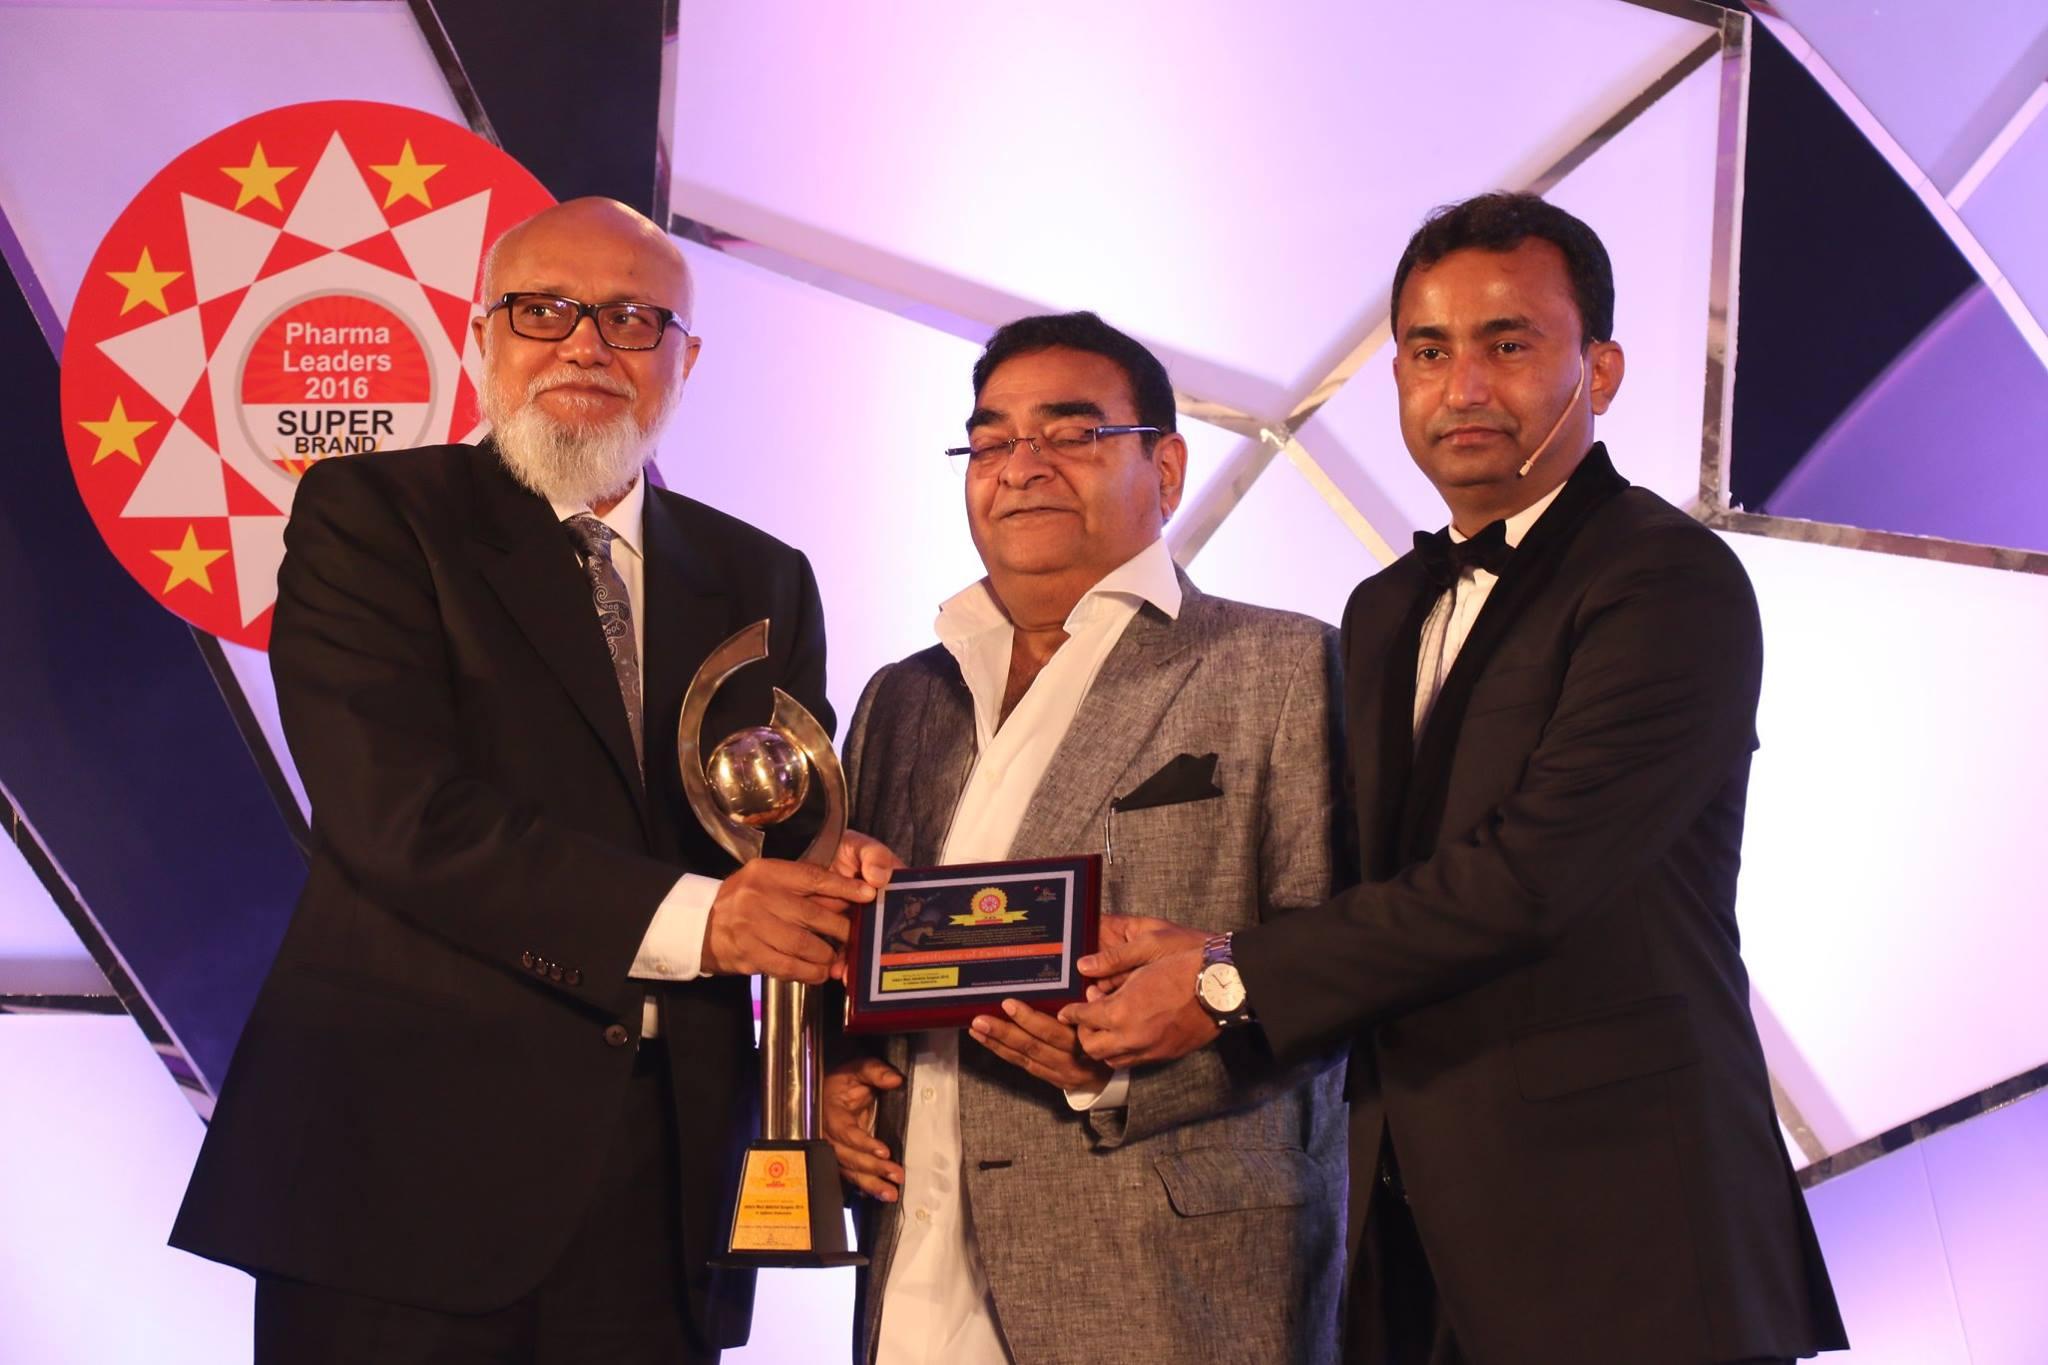 Dr. Sudhansu Bhattacharyya